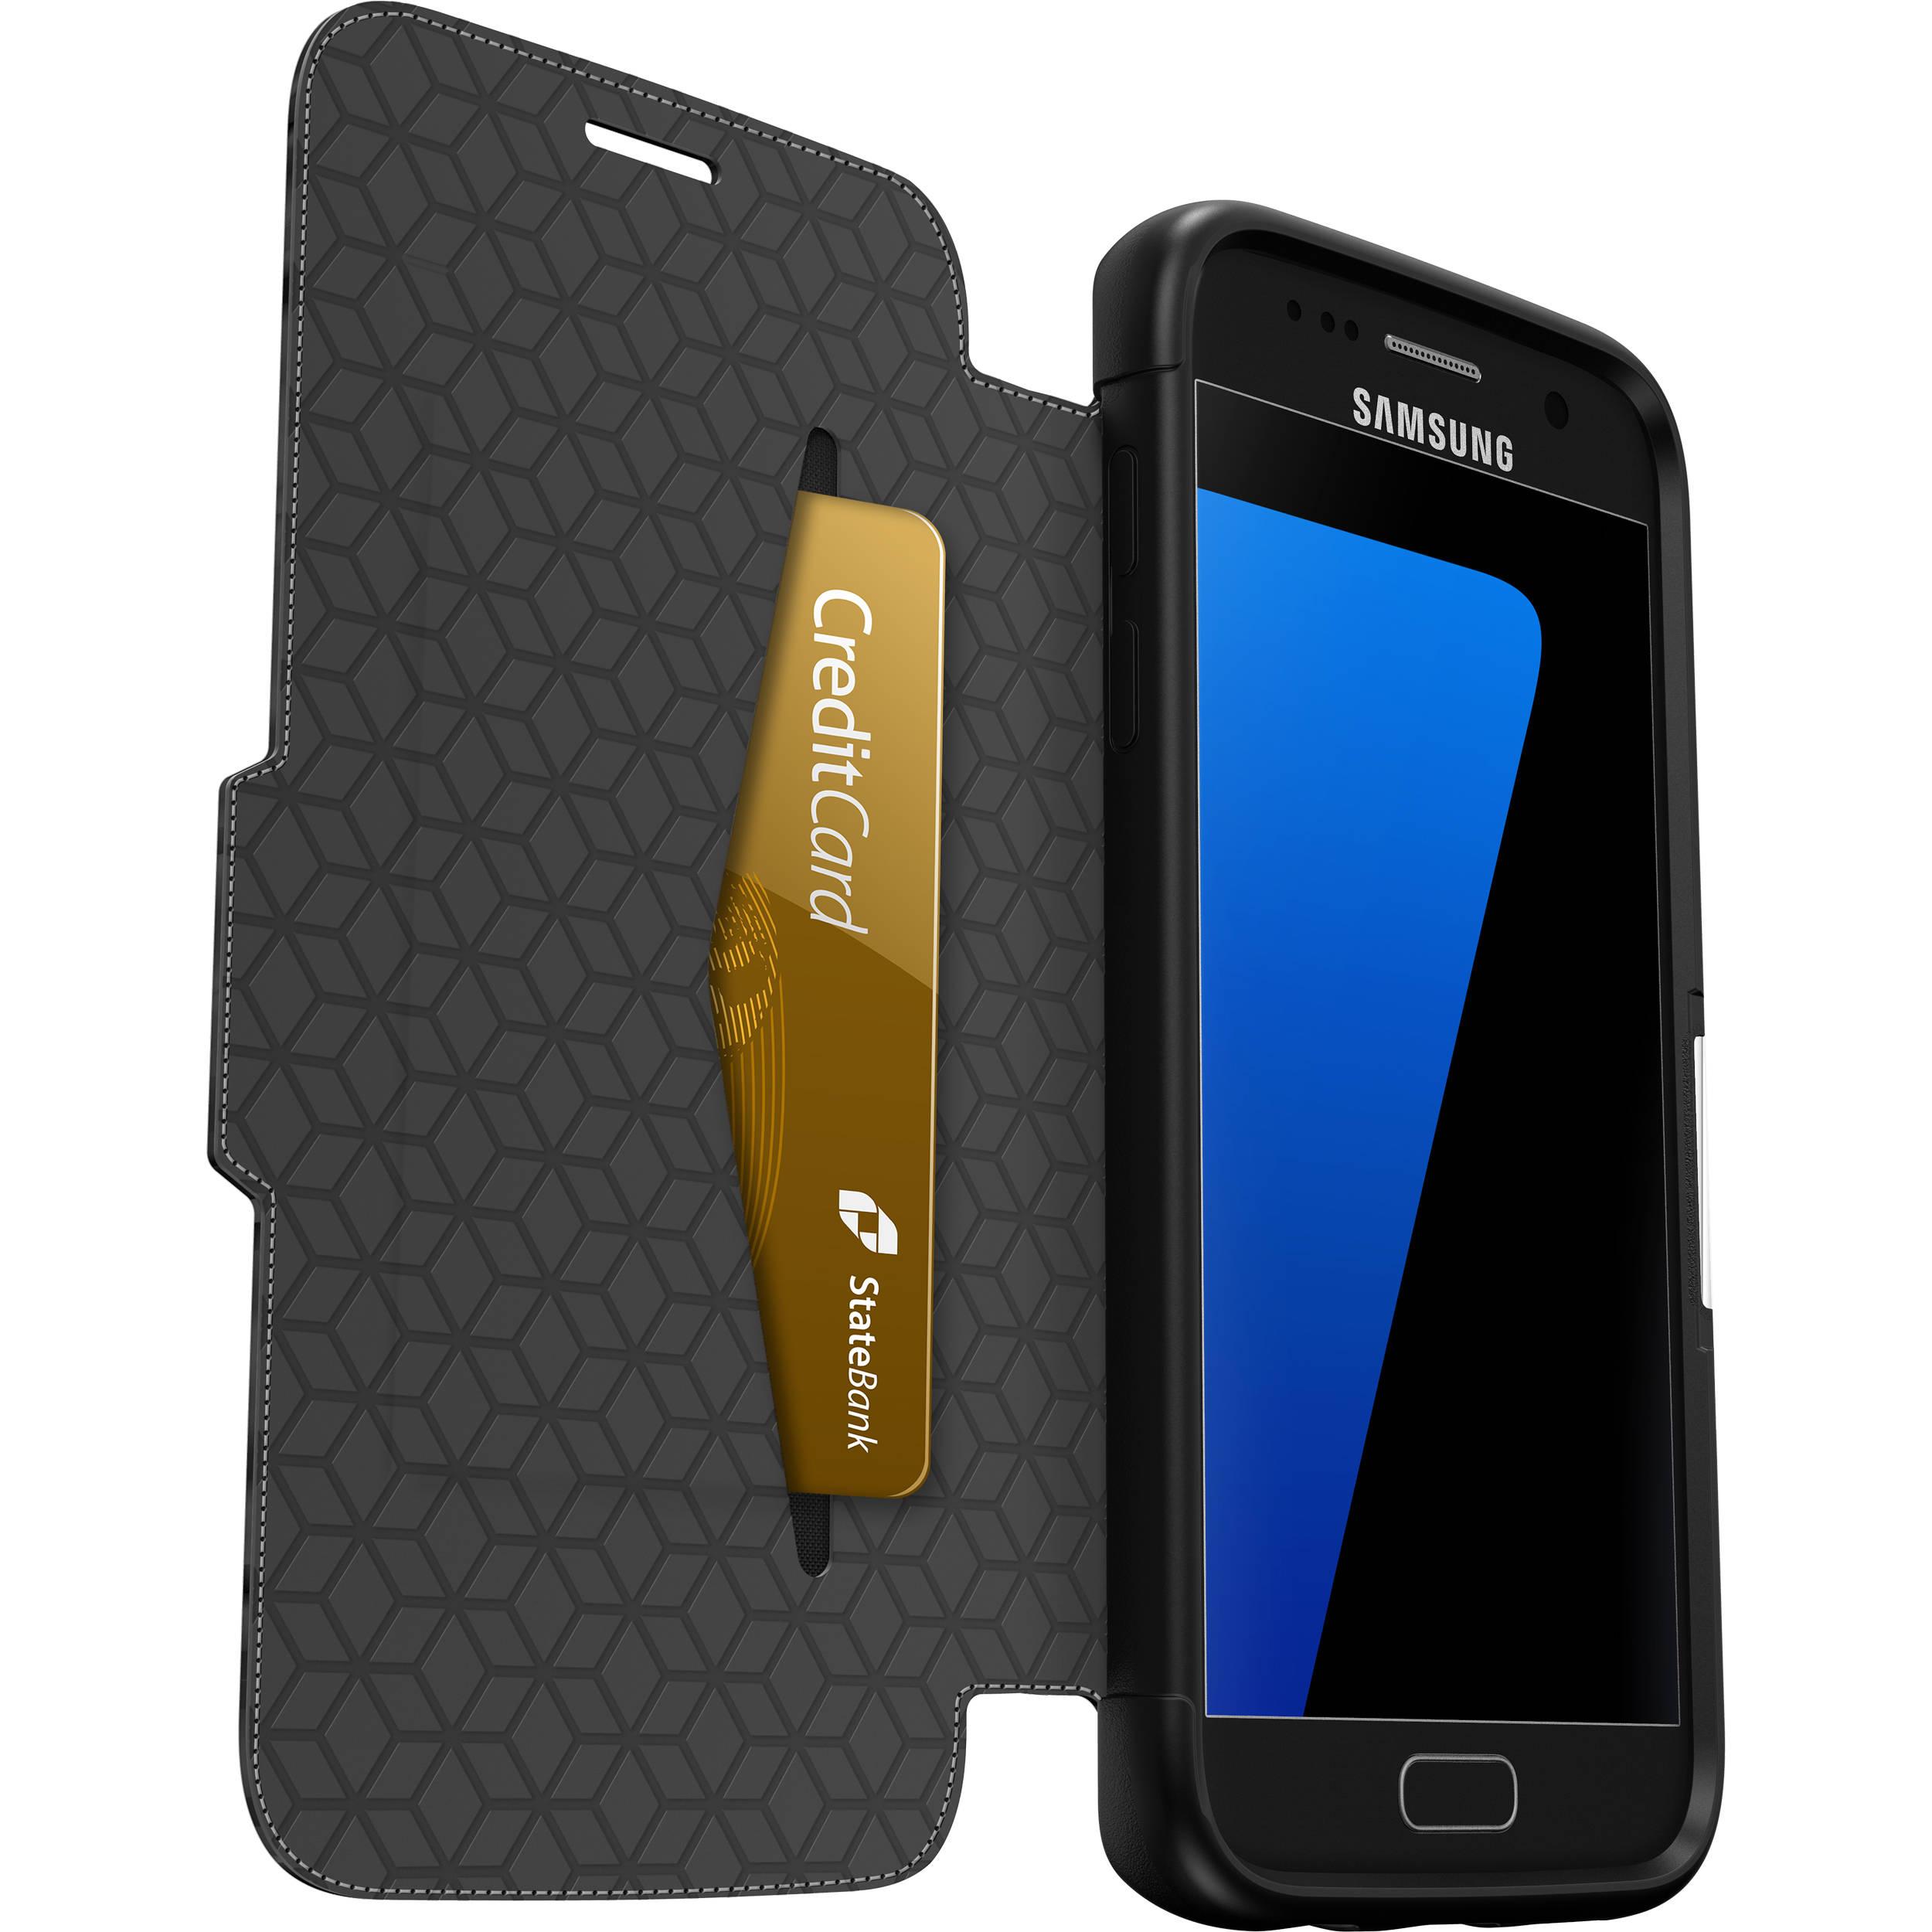 promo code 8ea01 bd99d OtterBox Strada Case for Galaxy S7 (Onyx Black)